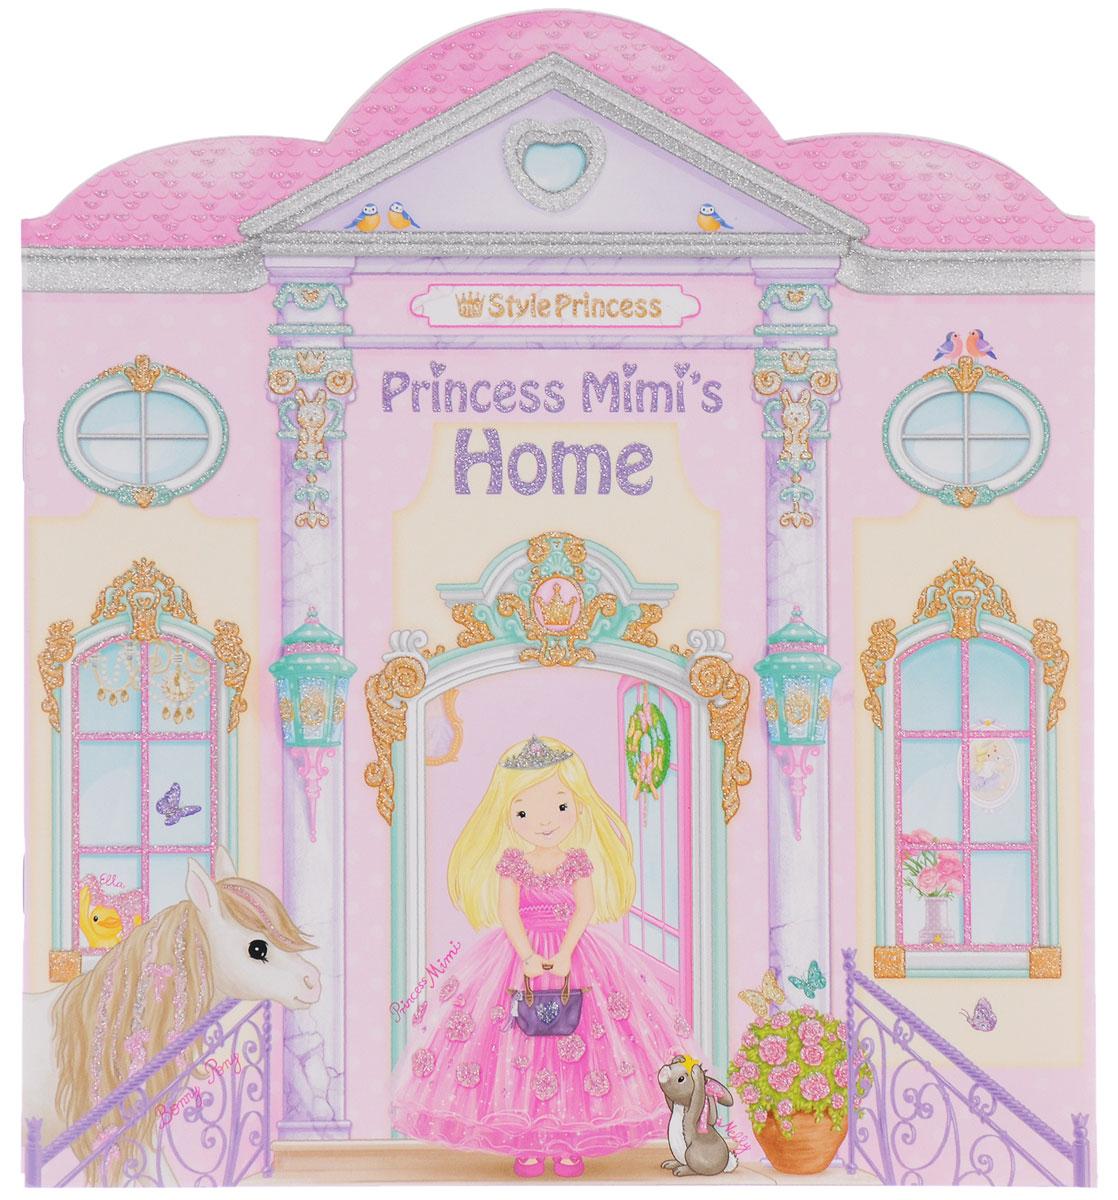 My Style Princess: Princess Mimi's Home / Дом принцессы Мими. Развивающий альбом с наклейками